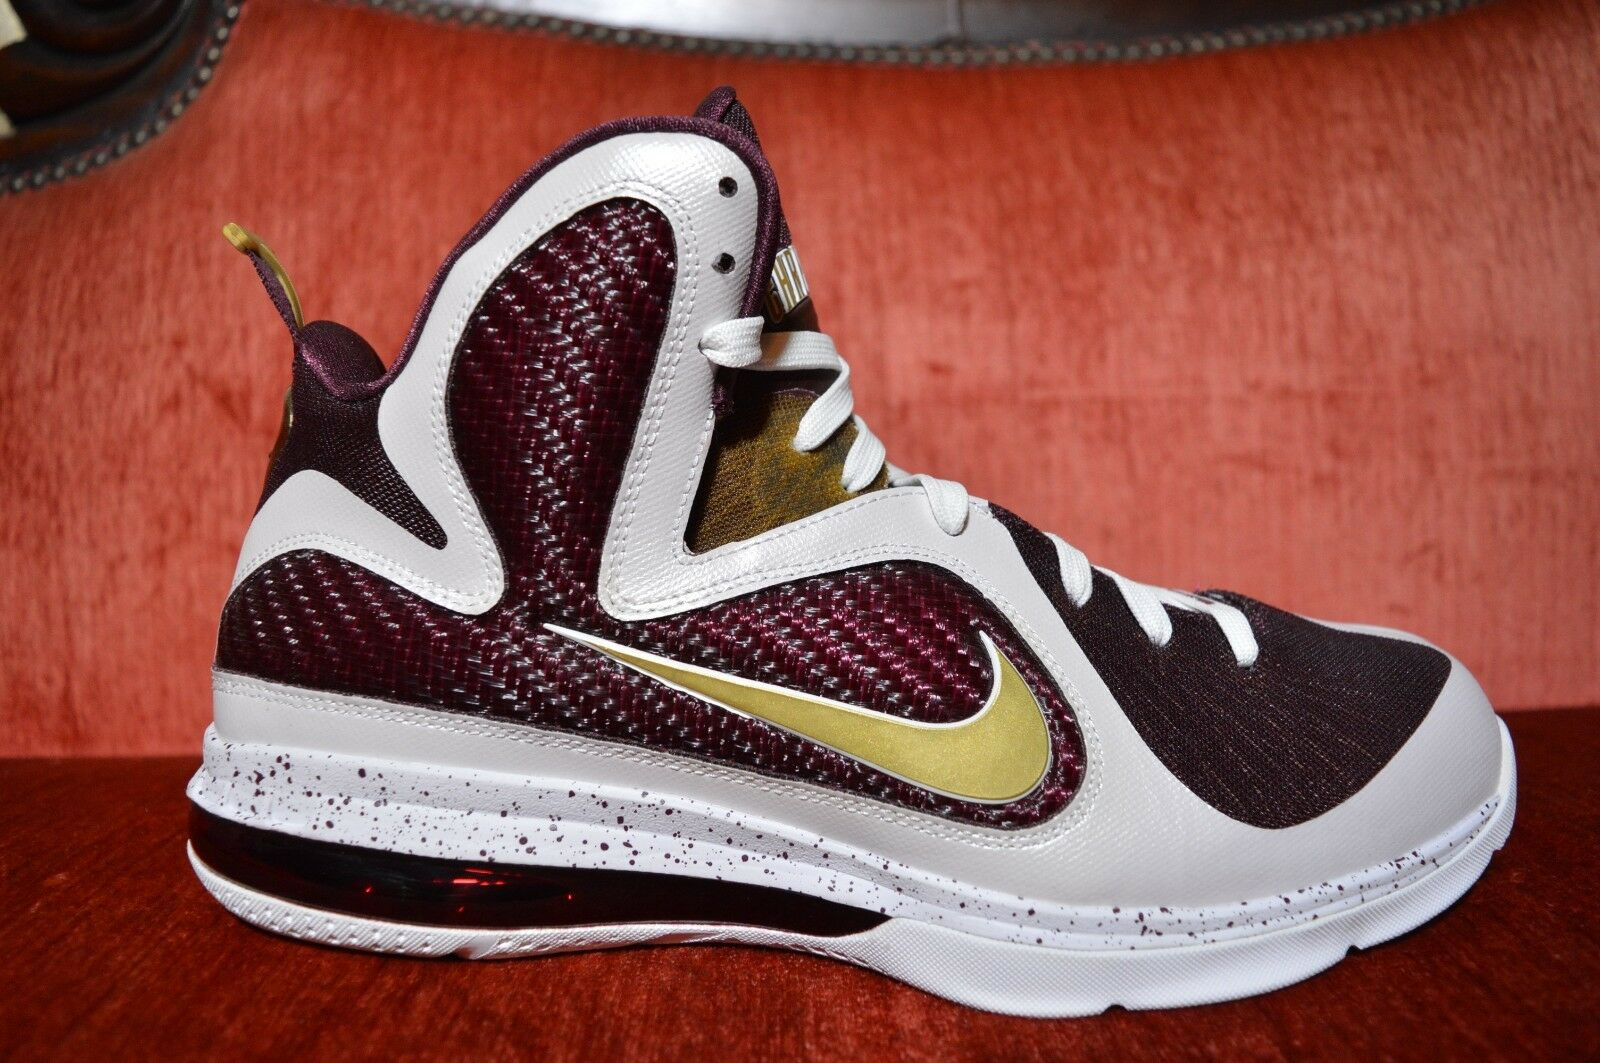 NEW Nike Lebron 9 IX CTK Christ The King PE PROMO SAMPLE Size 11 HOME 2012